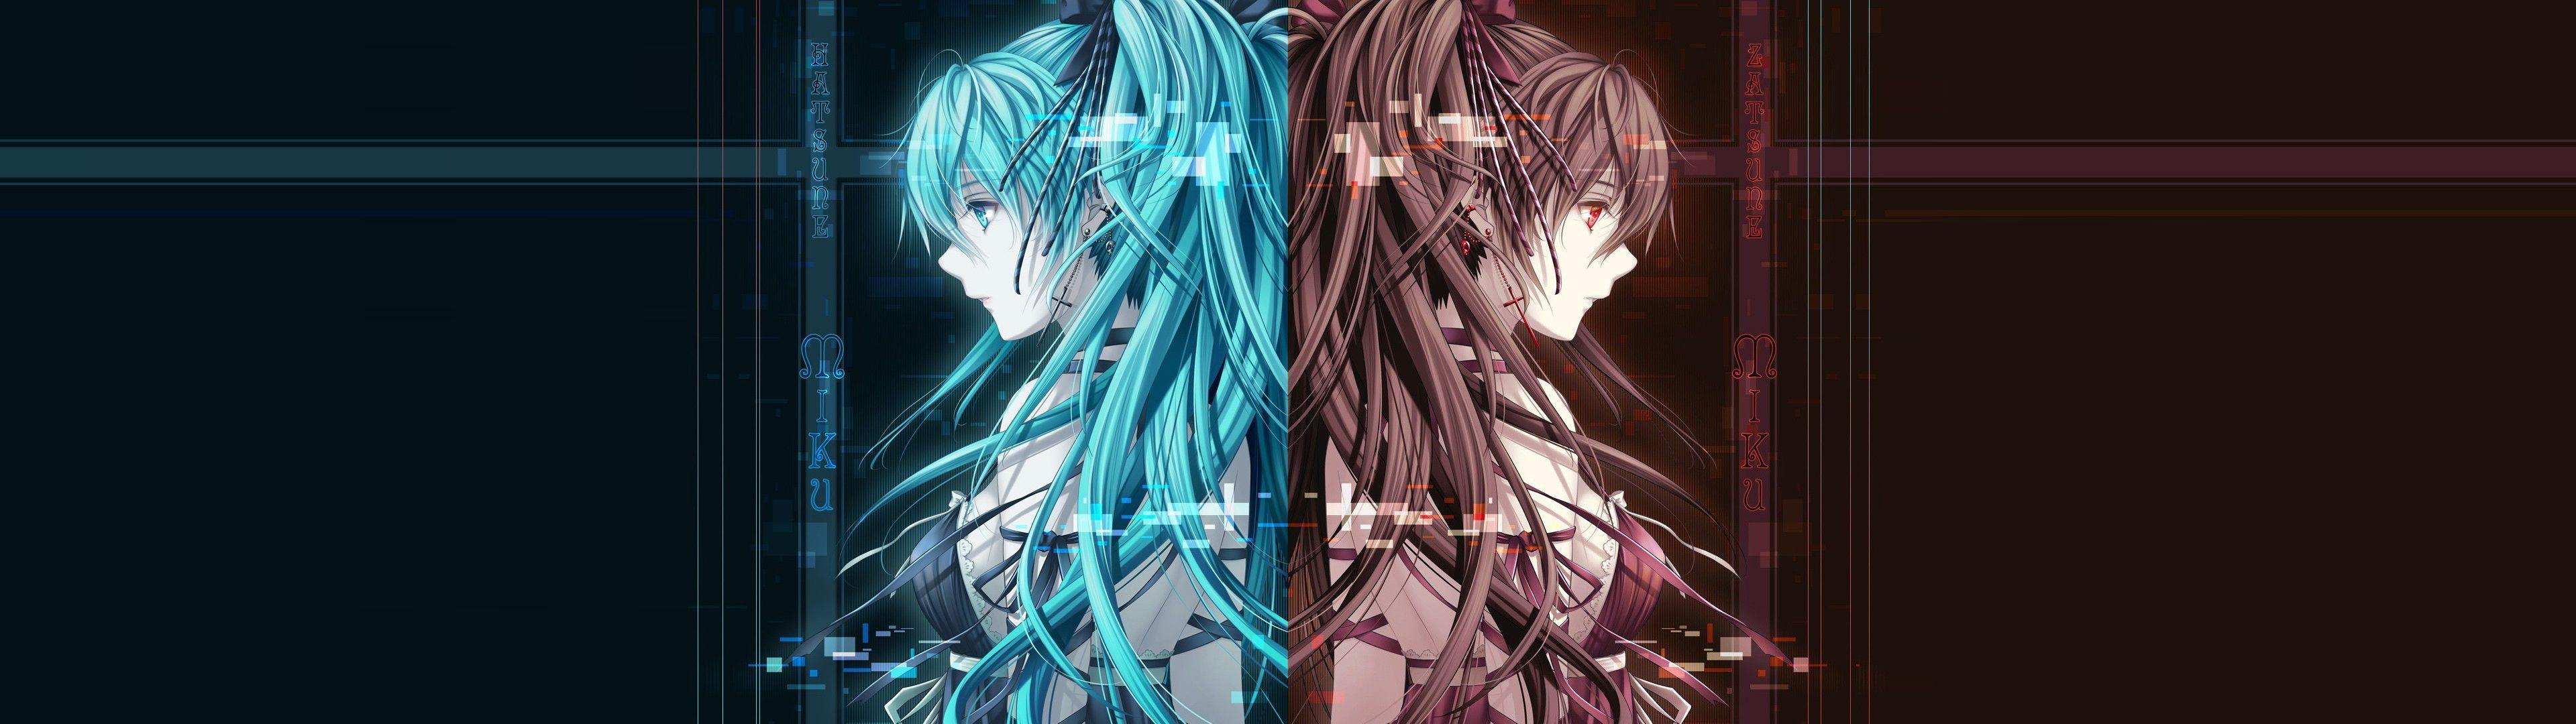 3840 X 1080 Anime Wallpapers Top Free 3840 X 1080 Anime